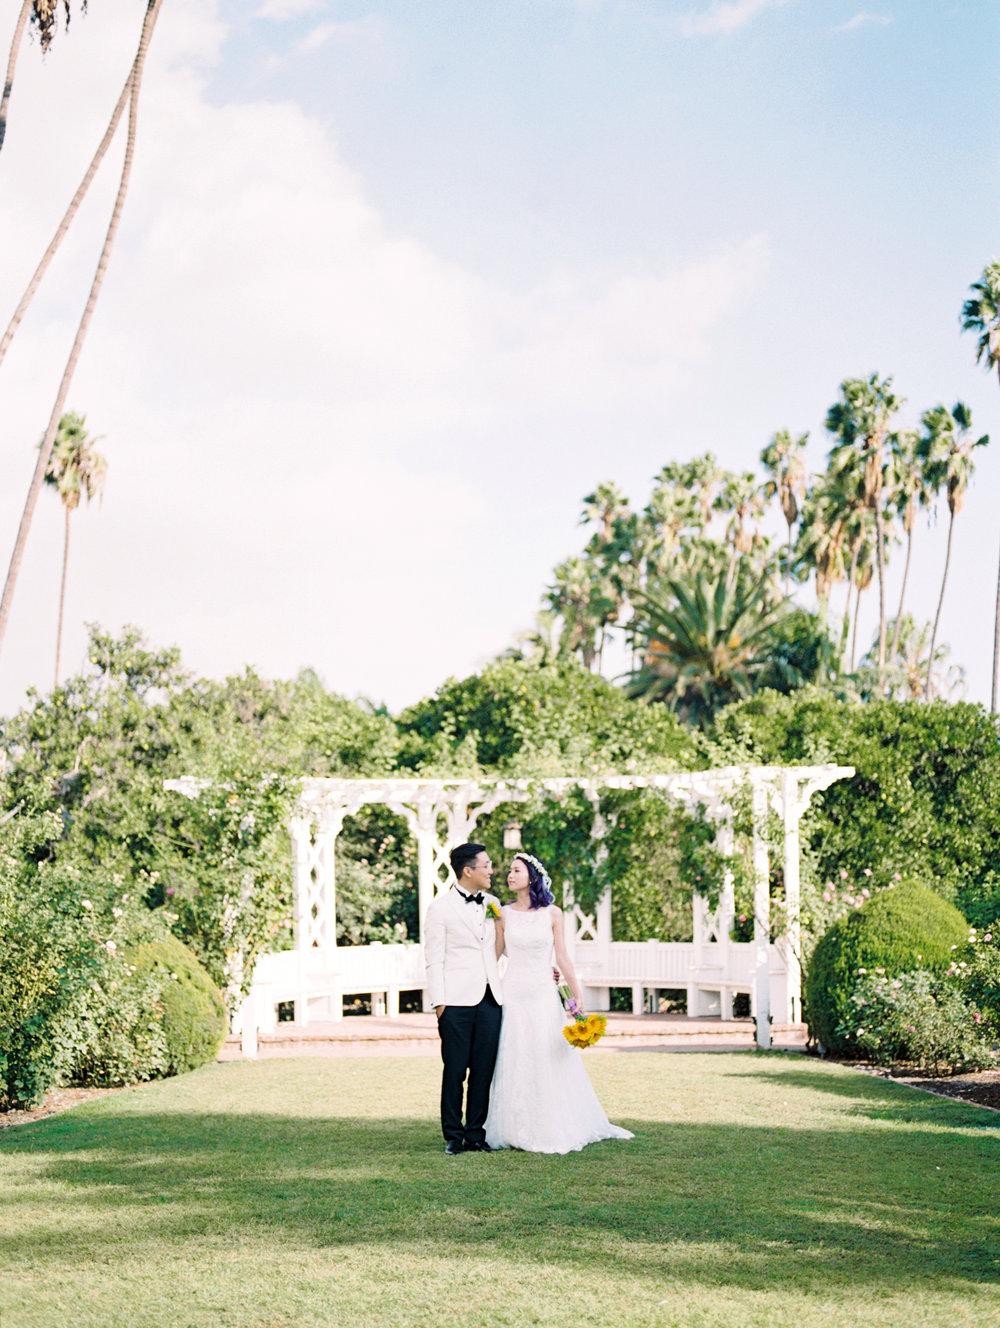 los-angeles-county-arboretum-and-botanic-garden-wedding-photos-photography249.jpg